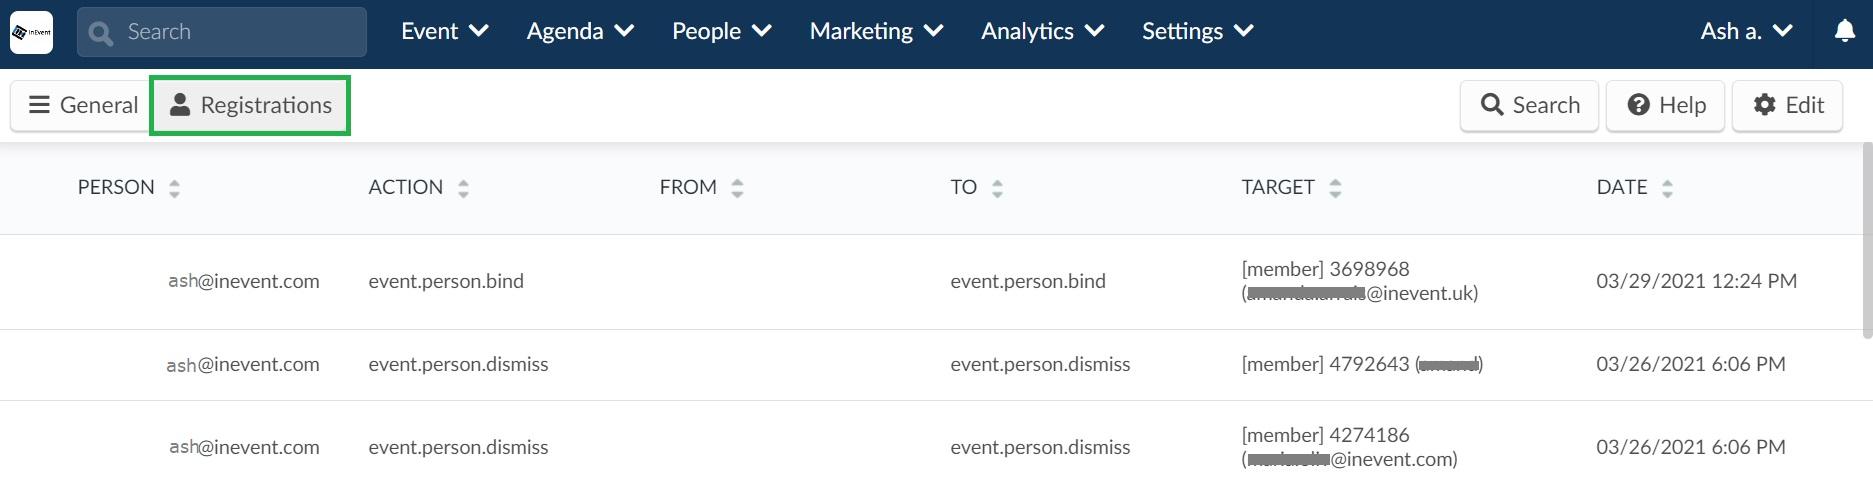 Screenshot of the filter Registrations